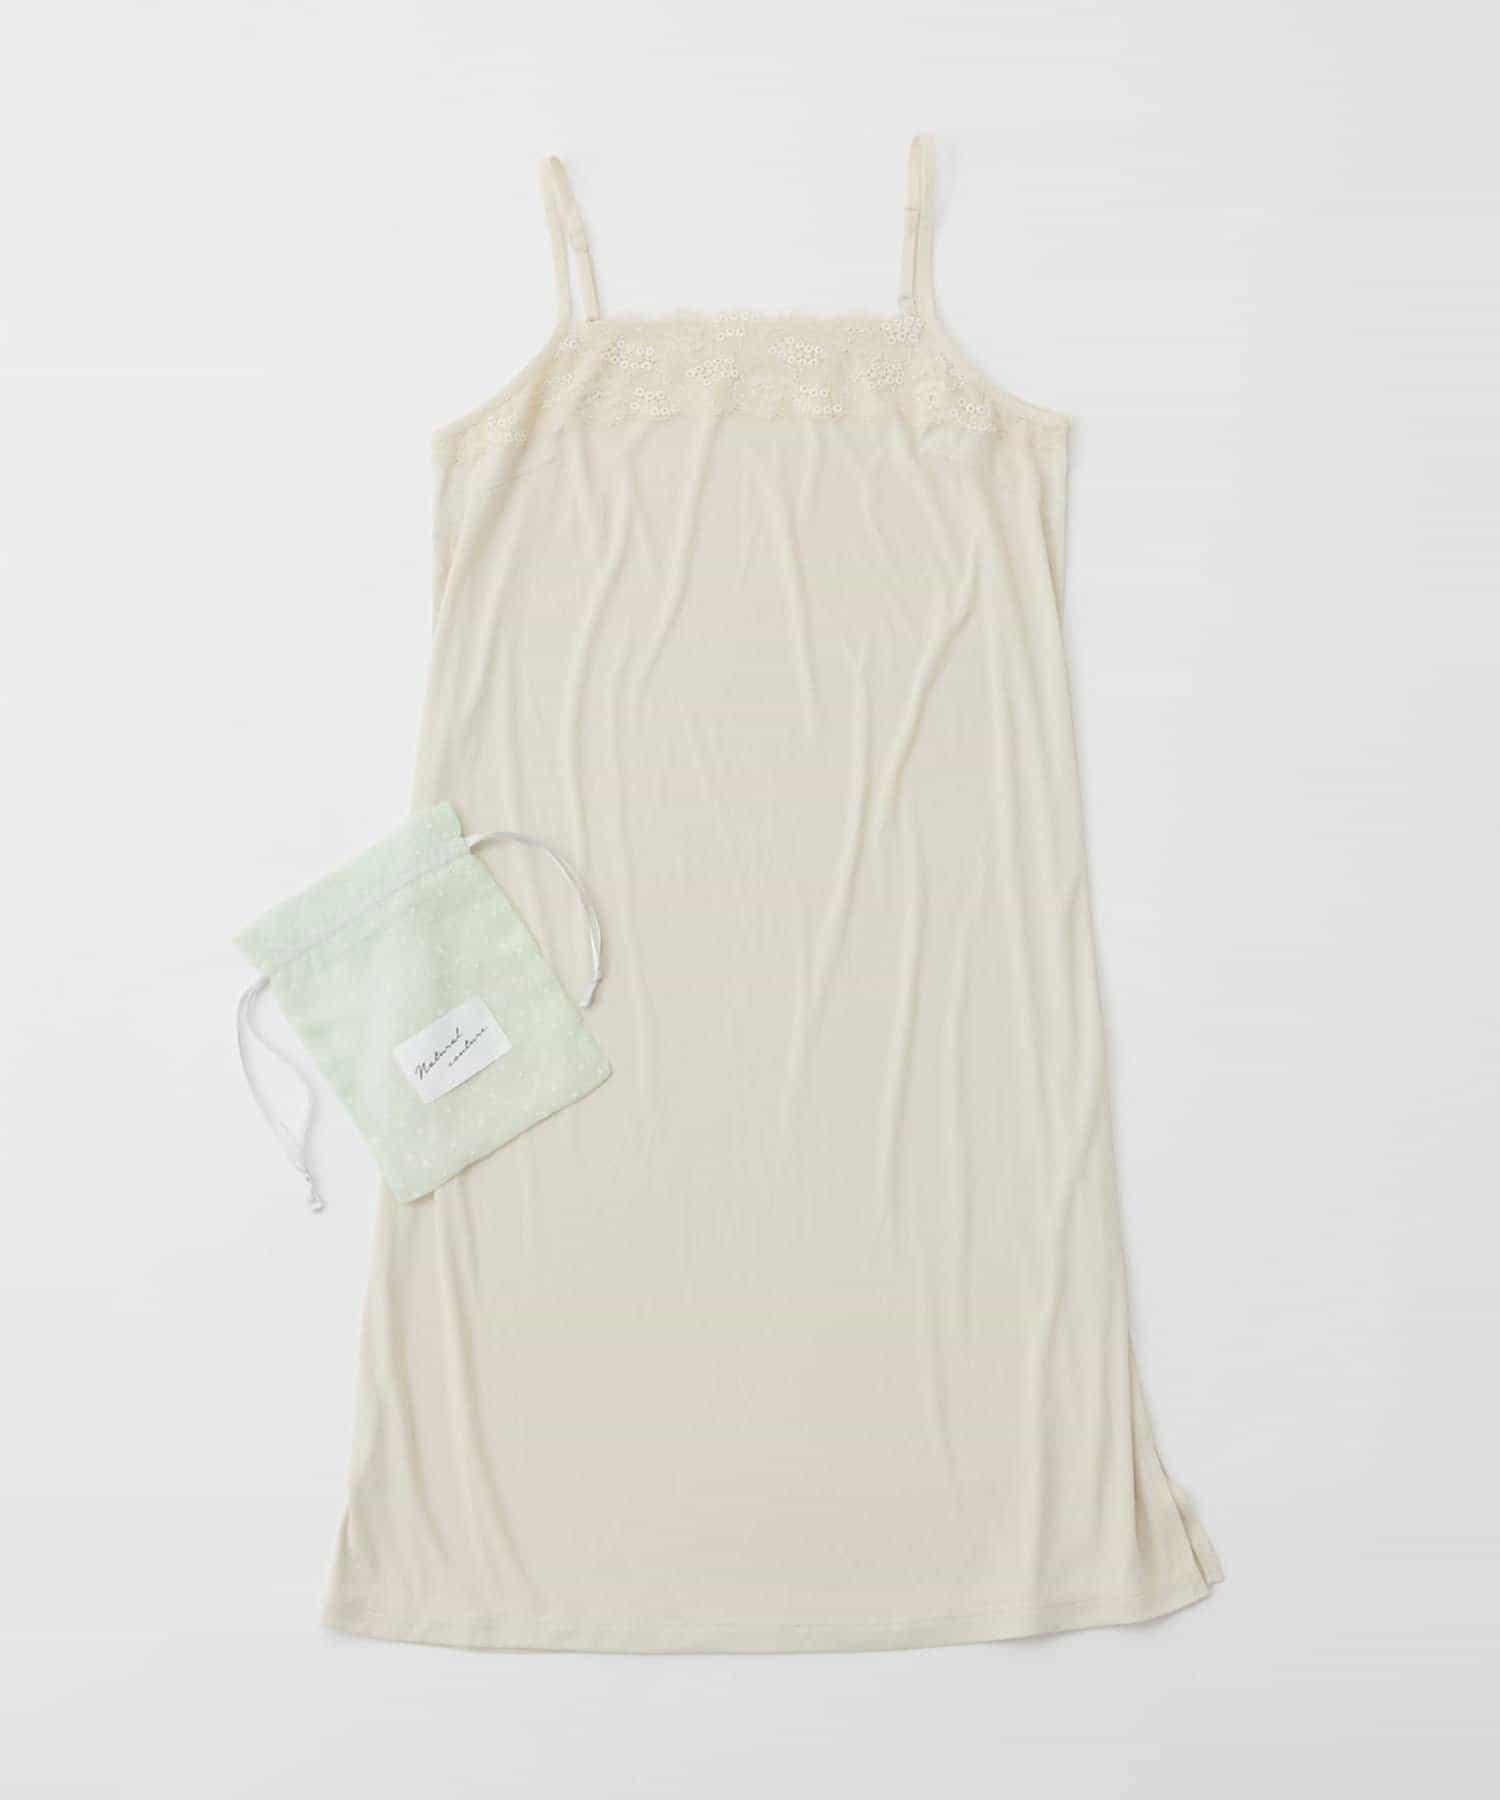 natural couture(ナチュラルクチュール) 巾着付きレースインナードレス